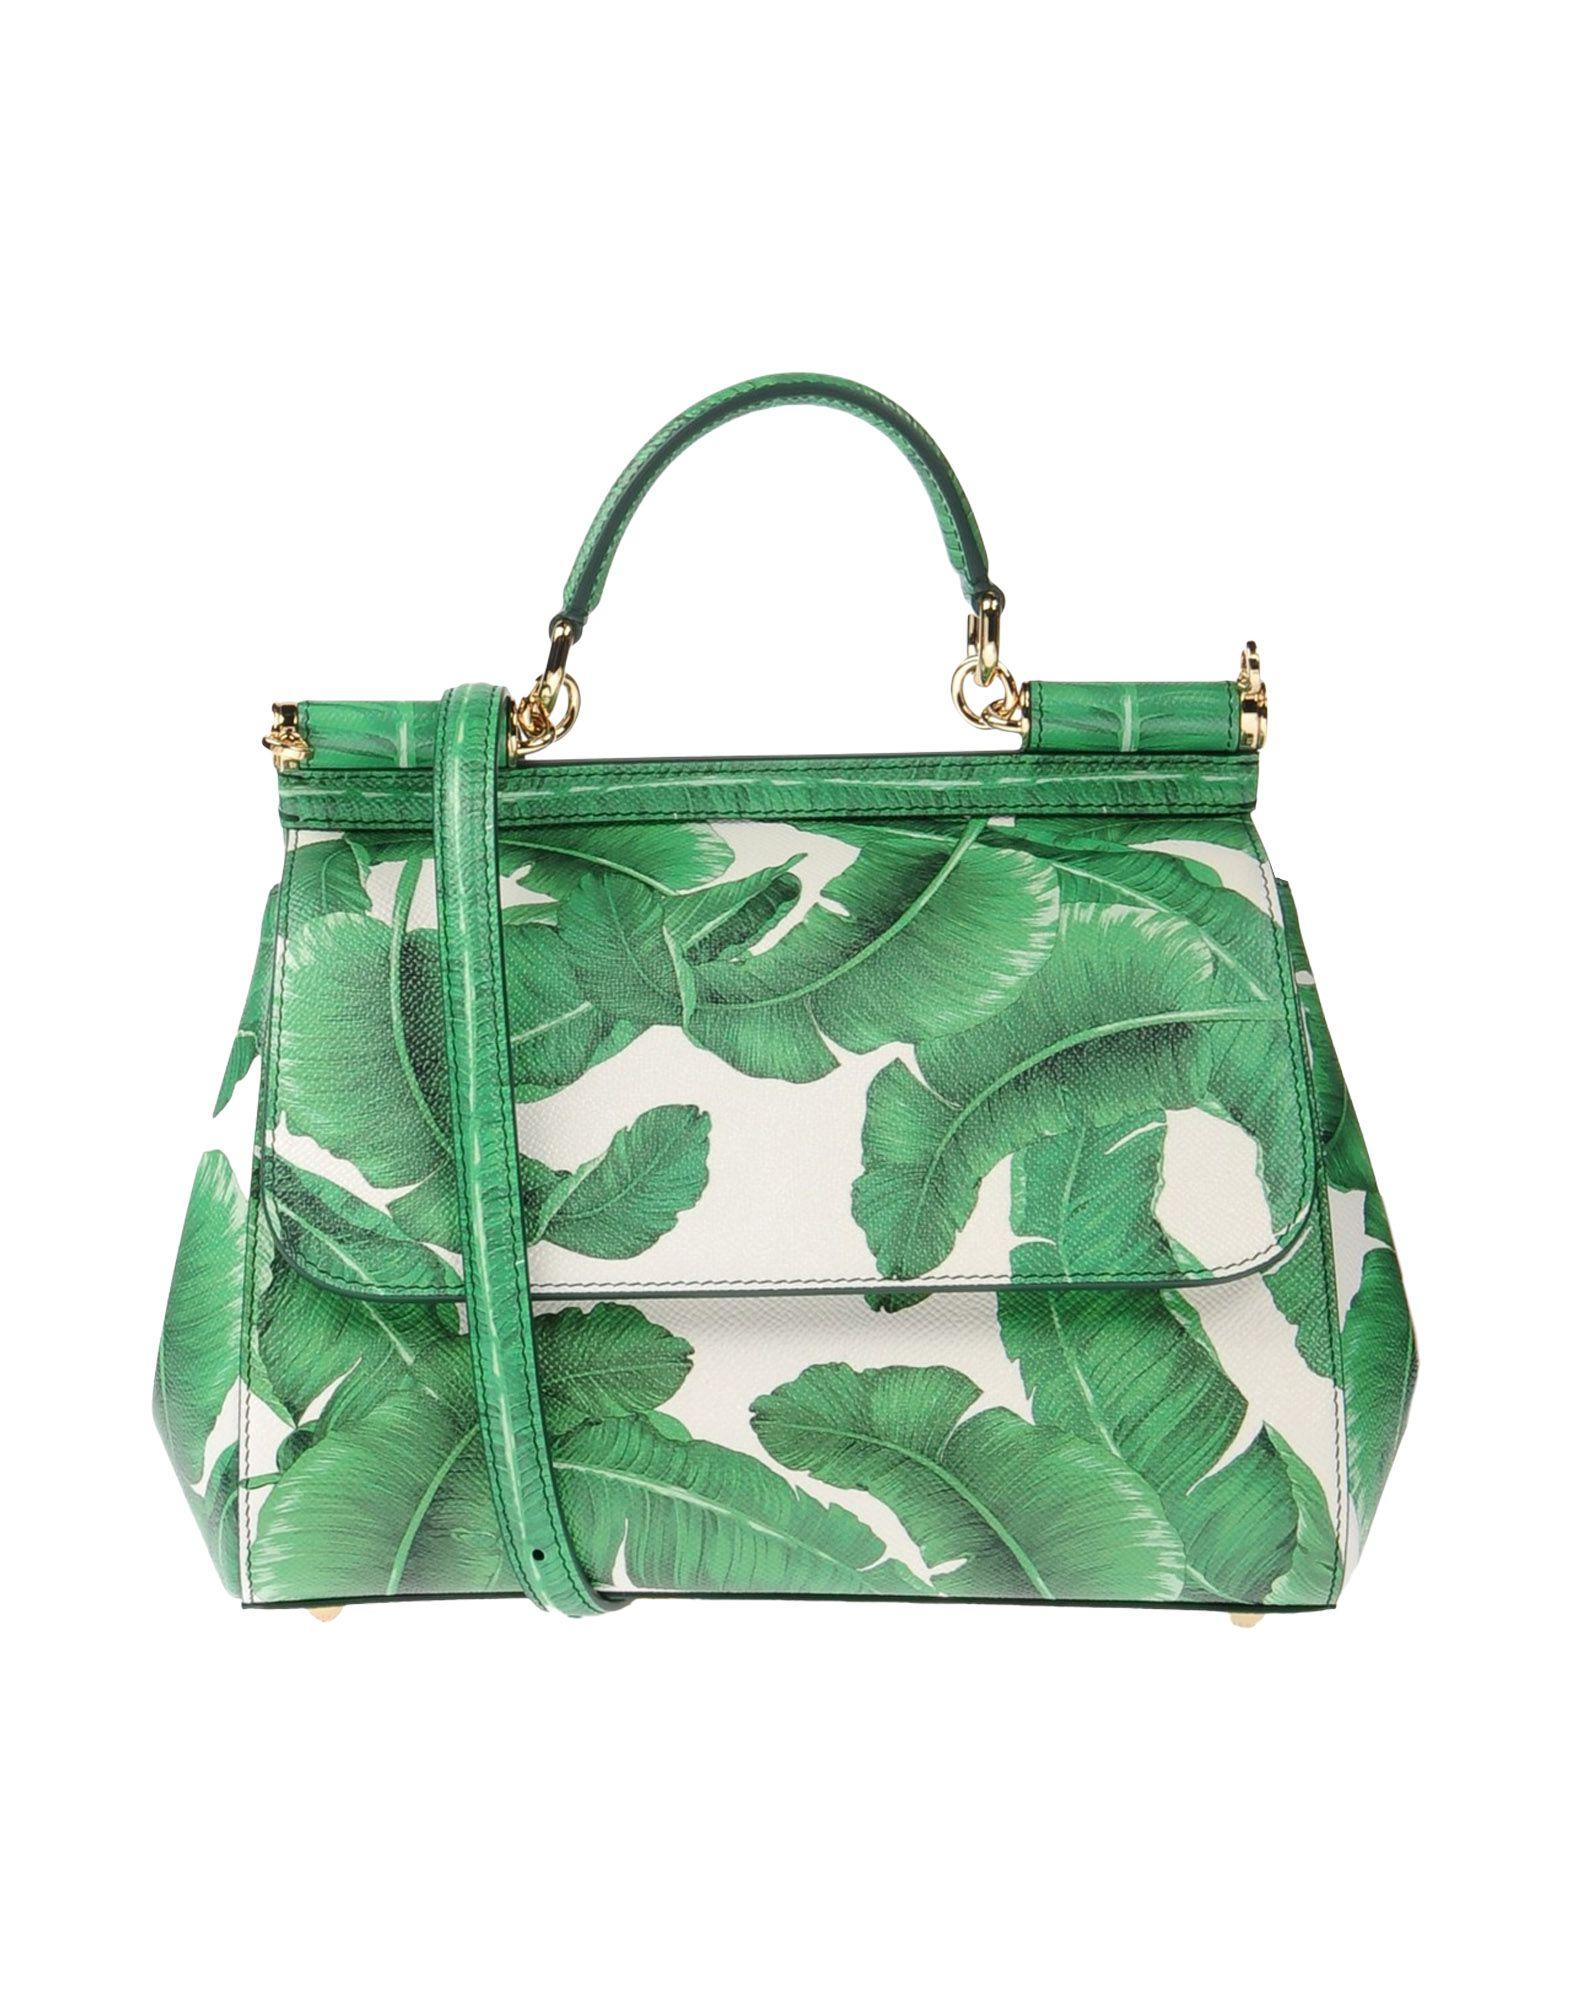 Dolce Gabbana Handbag Women Handbags Online On Yoox United States 45332912ru